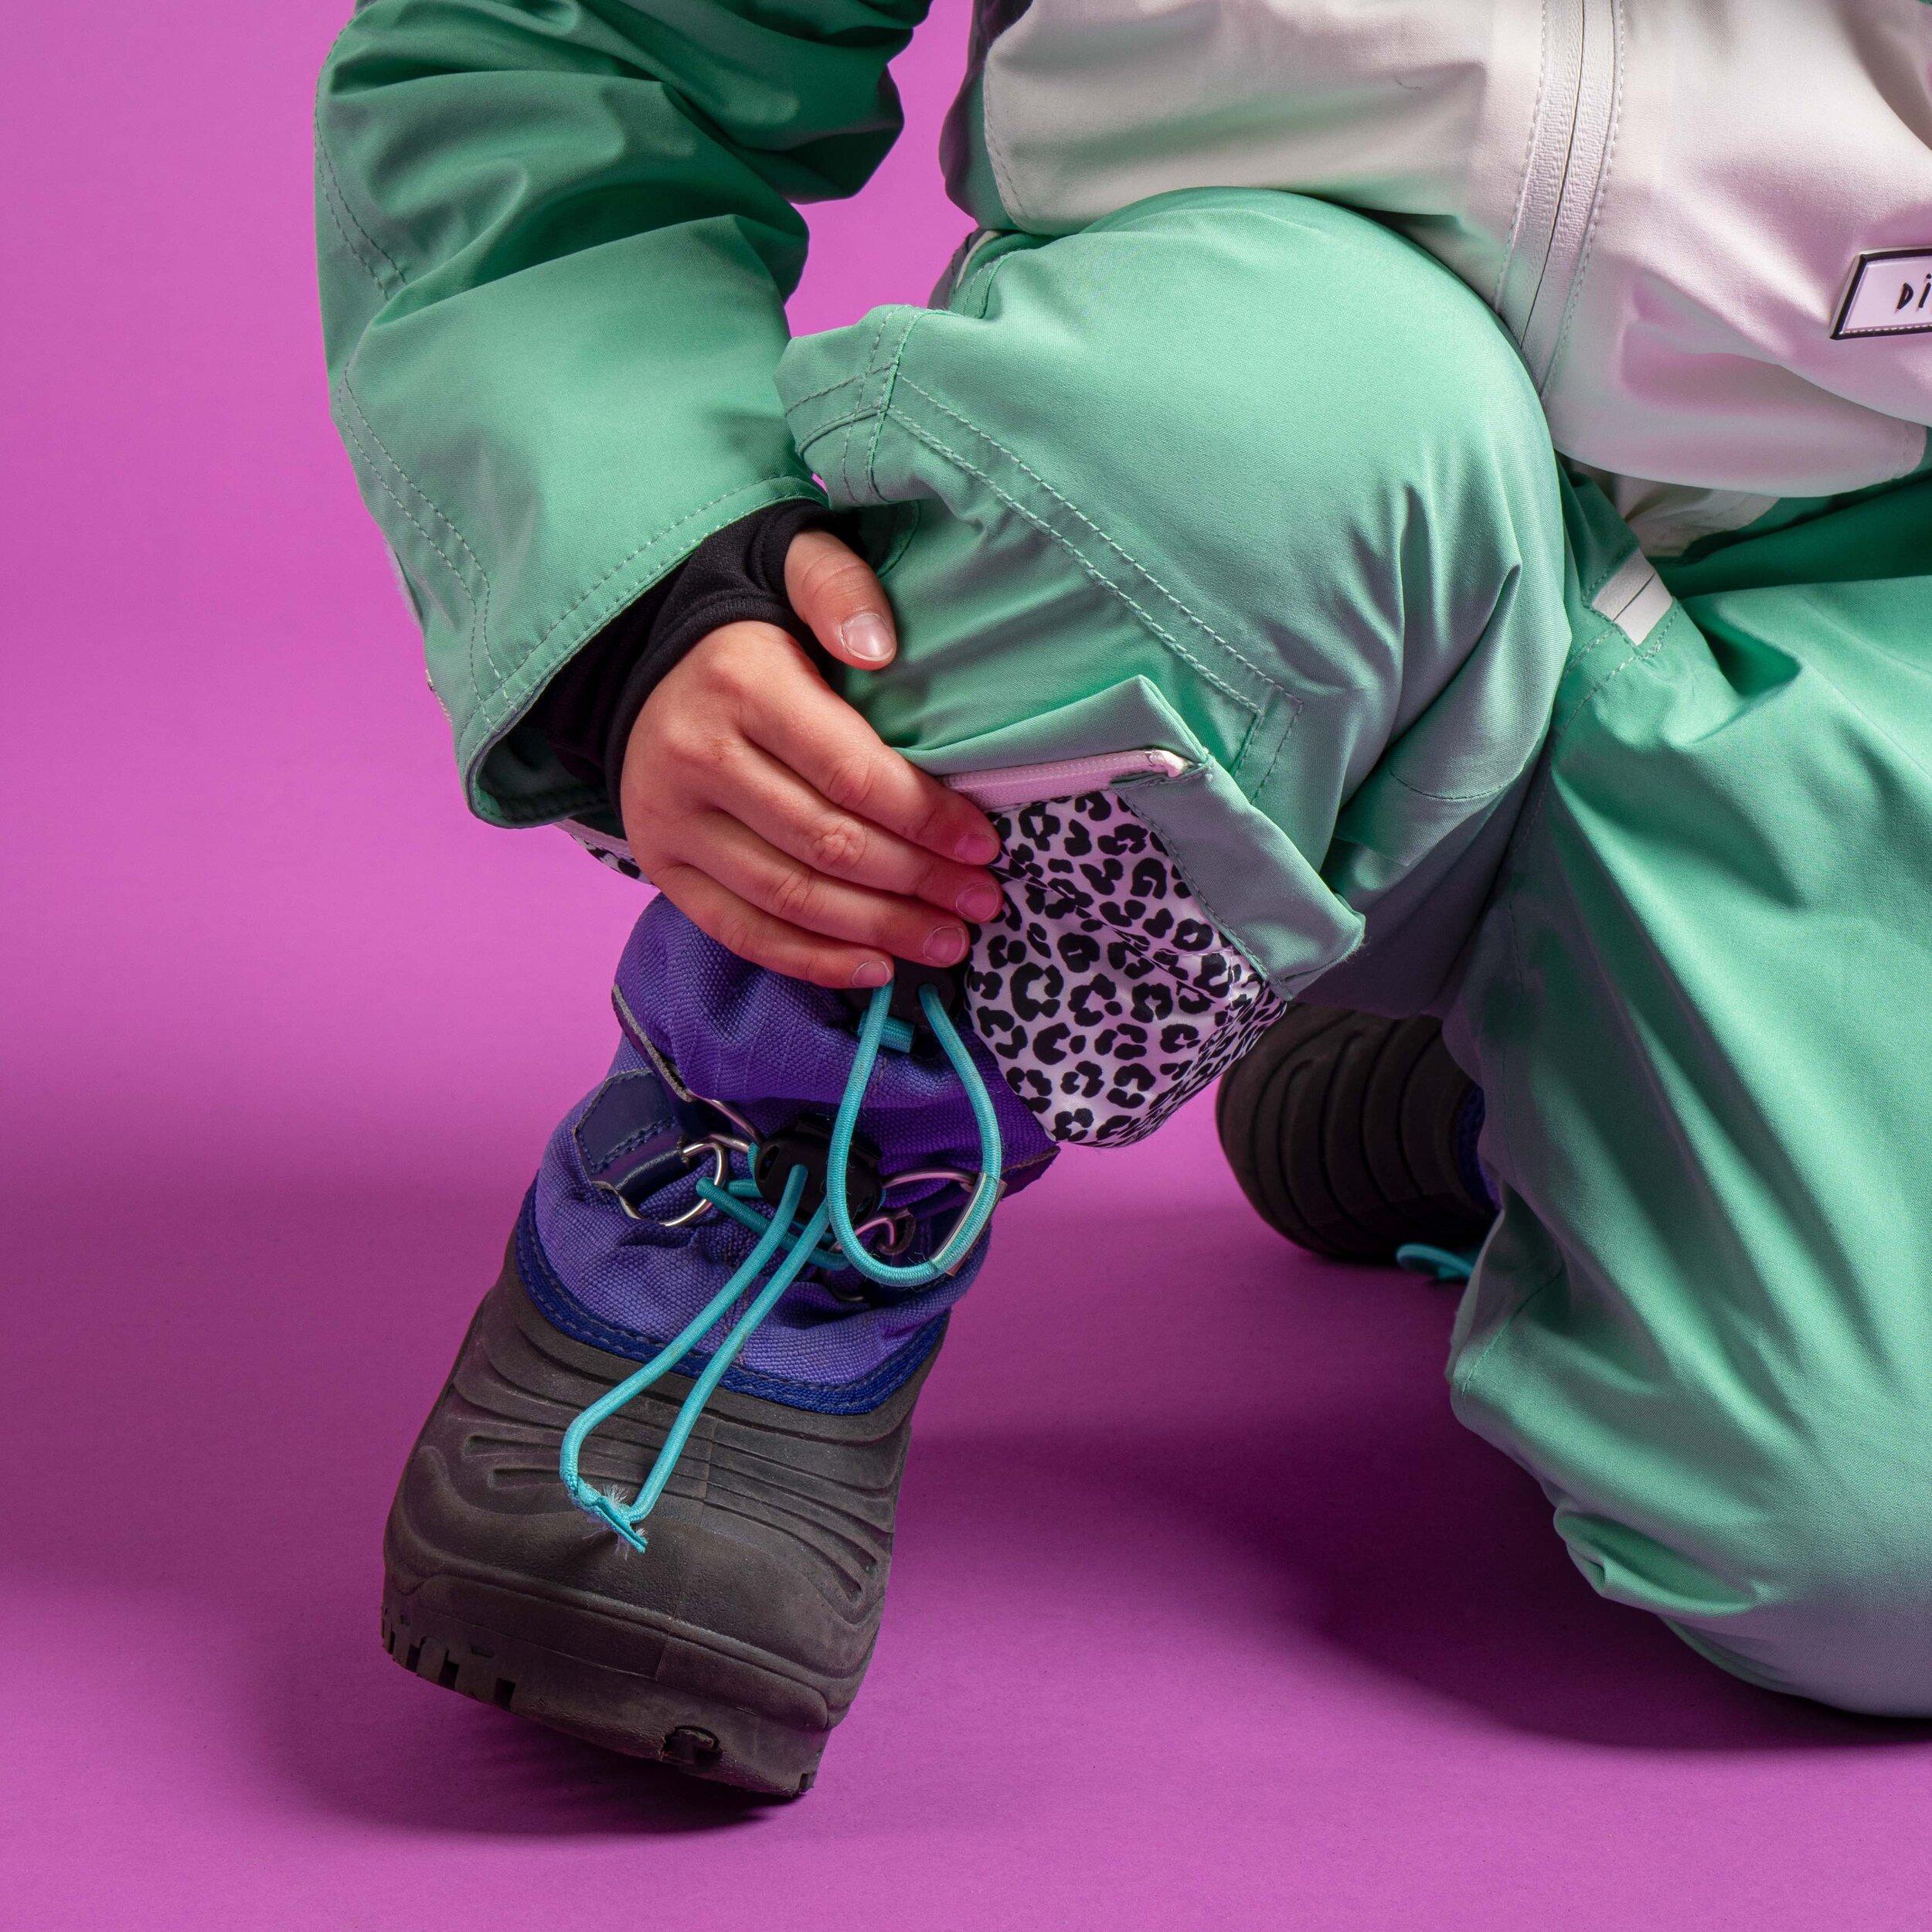 Dinoski-Dino-Boots.jpg